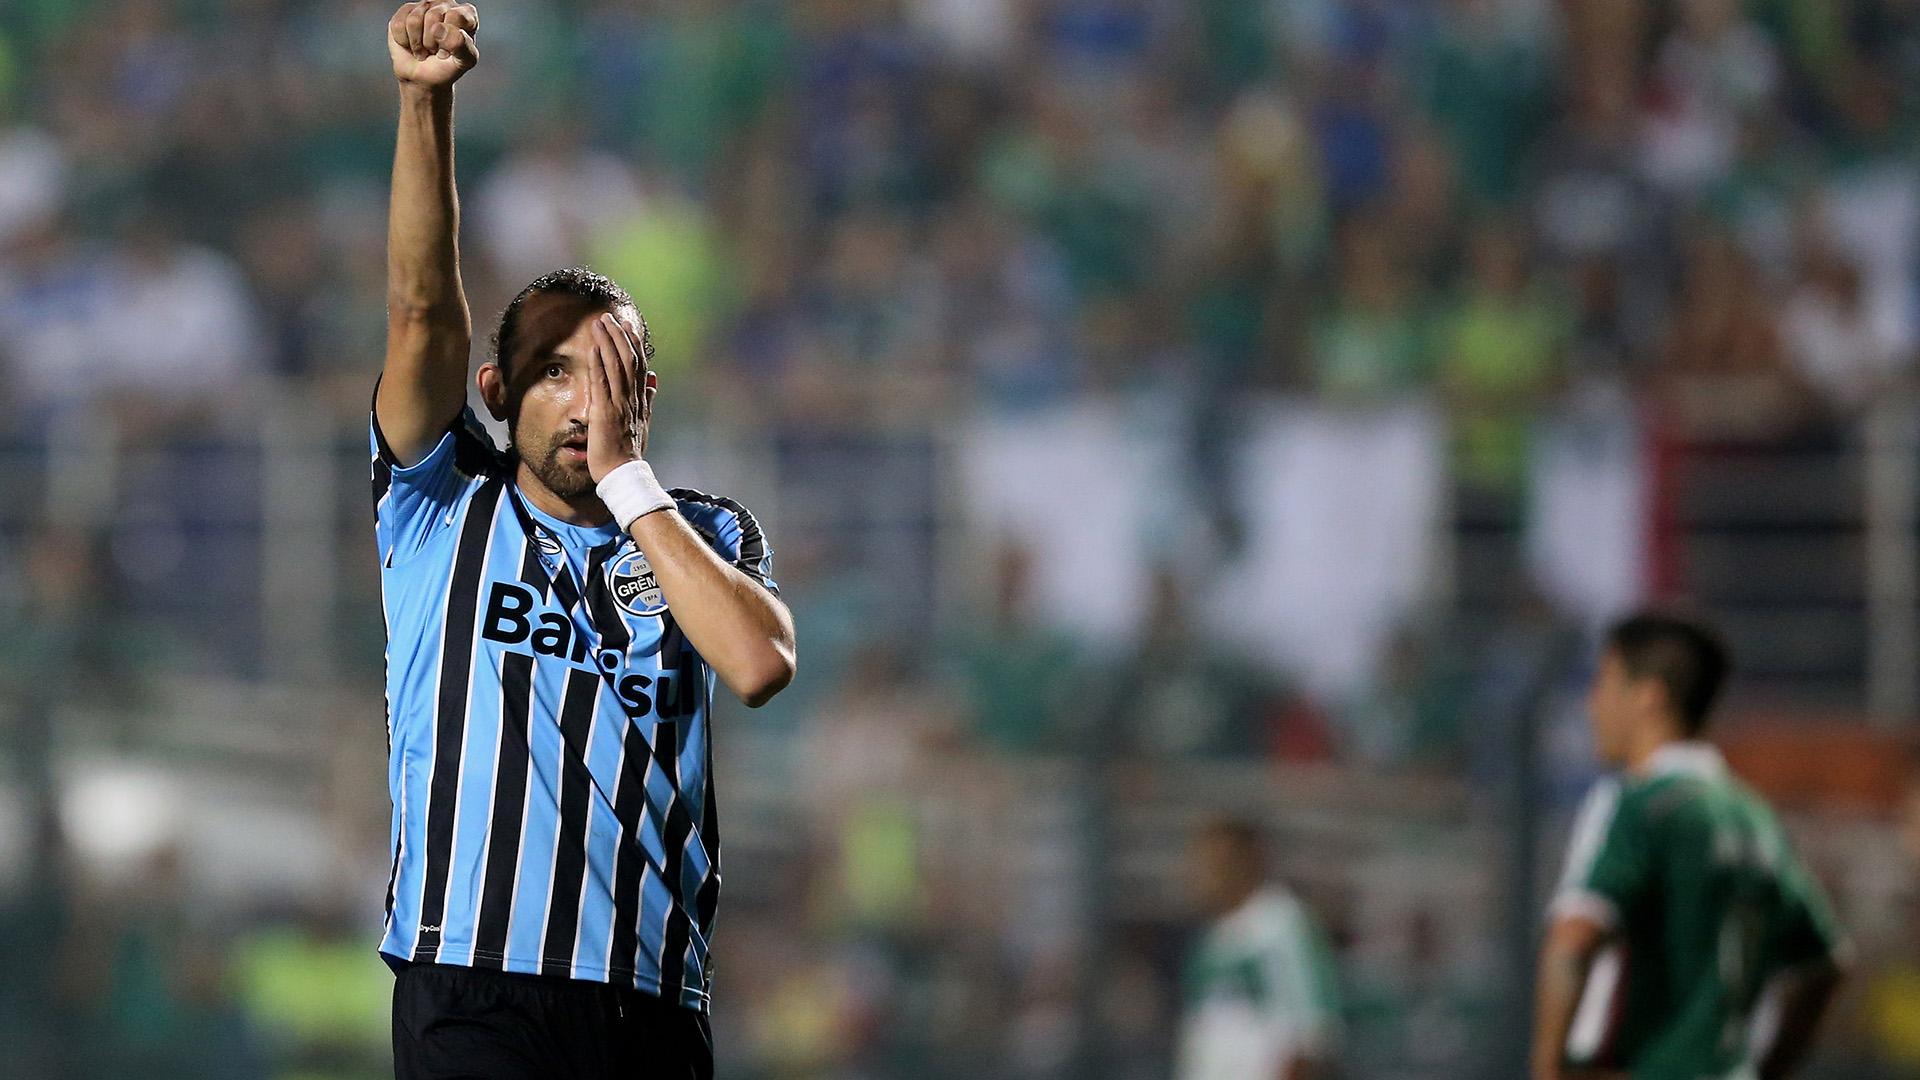 Hernán Barcos | Palmeiras 2-1 Grêmio | Brasileirão | 11 10 2014